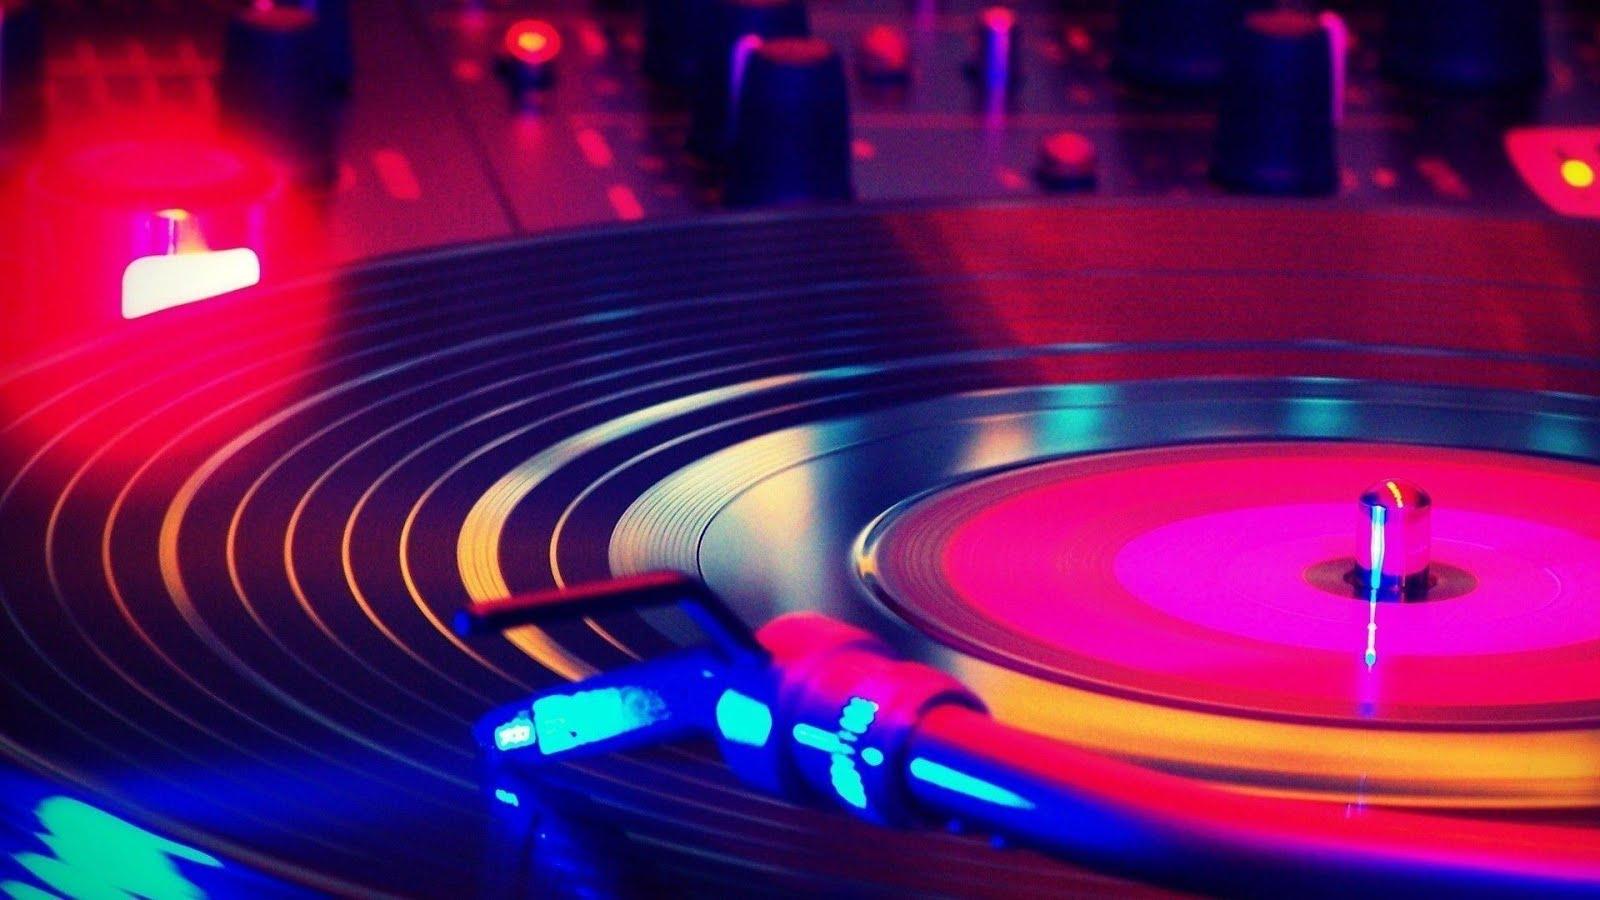 vip-remix for djs: New Music: Dutch House, Moombahton